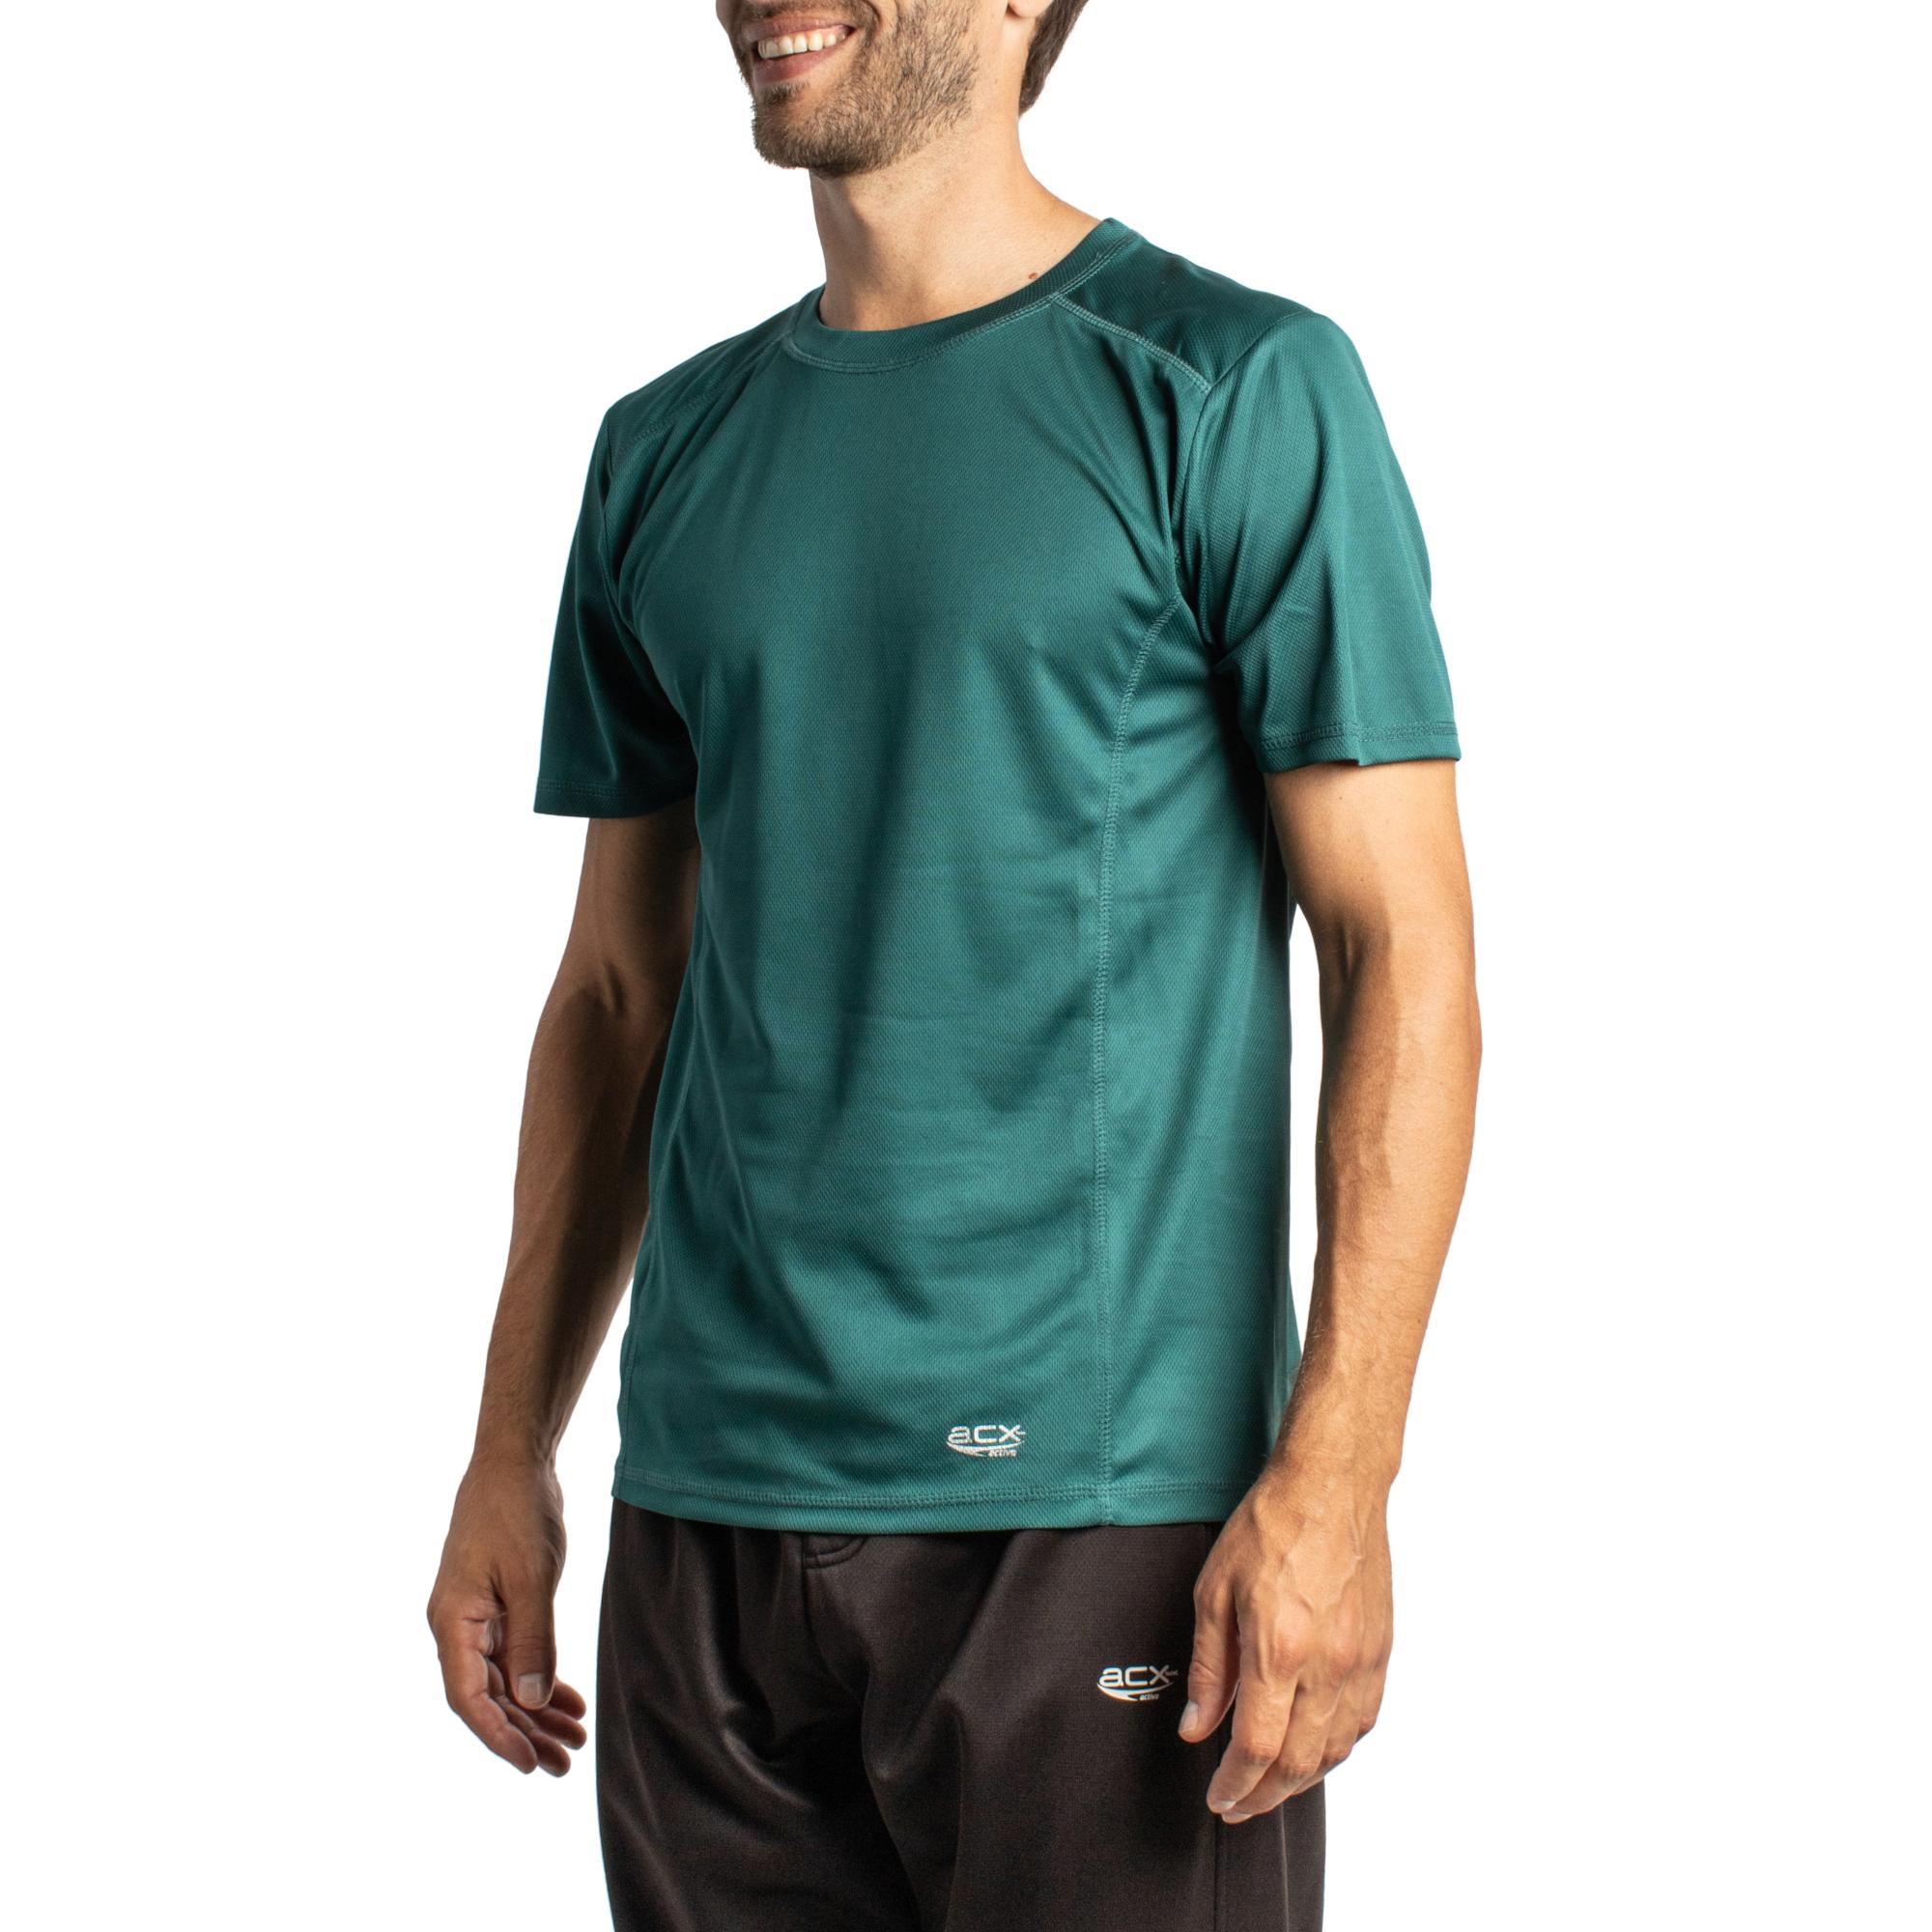 Kangaroo Poo Mens Surf Life T-Shirt Charcoal Marl Size XL 2XL 3XL BNWT RRP £15